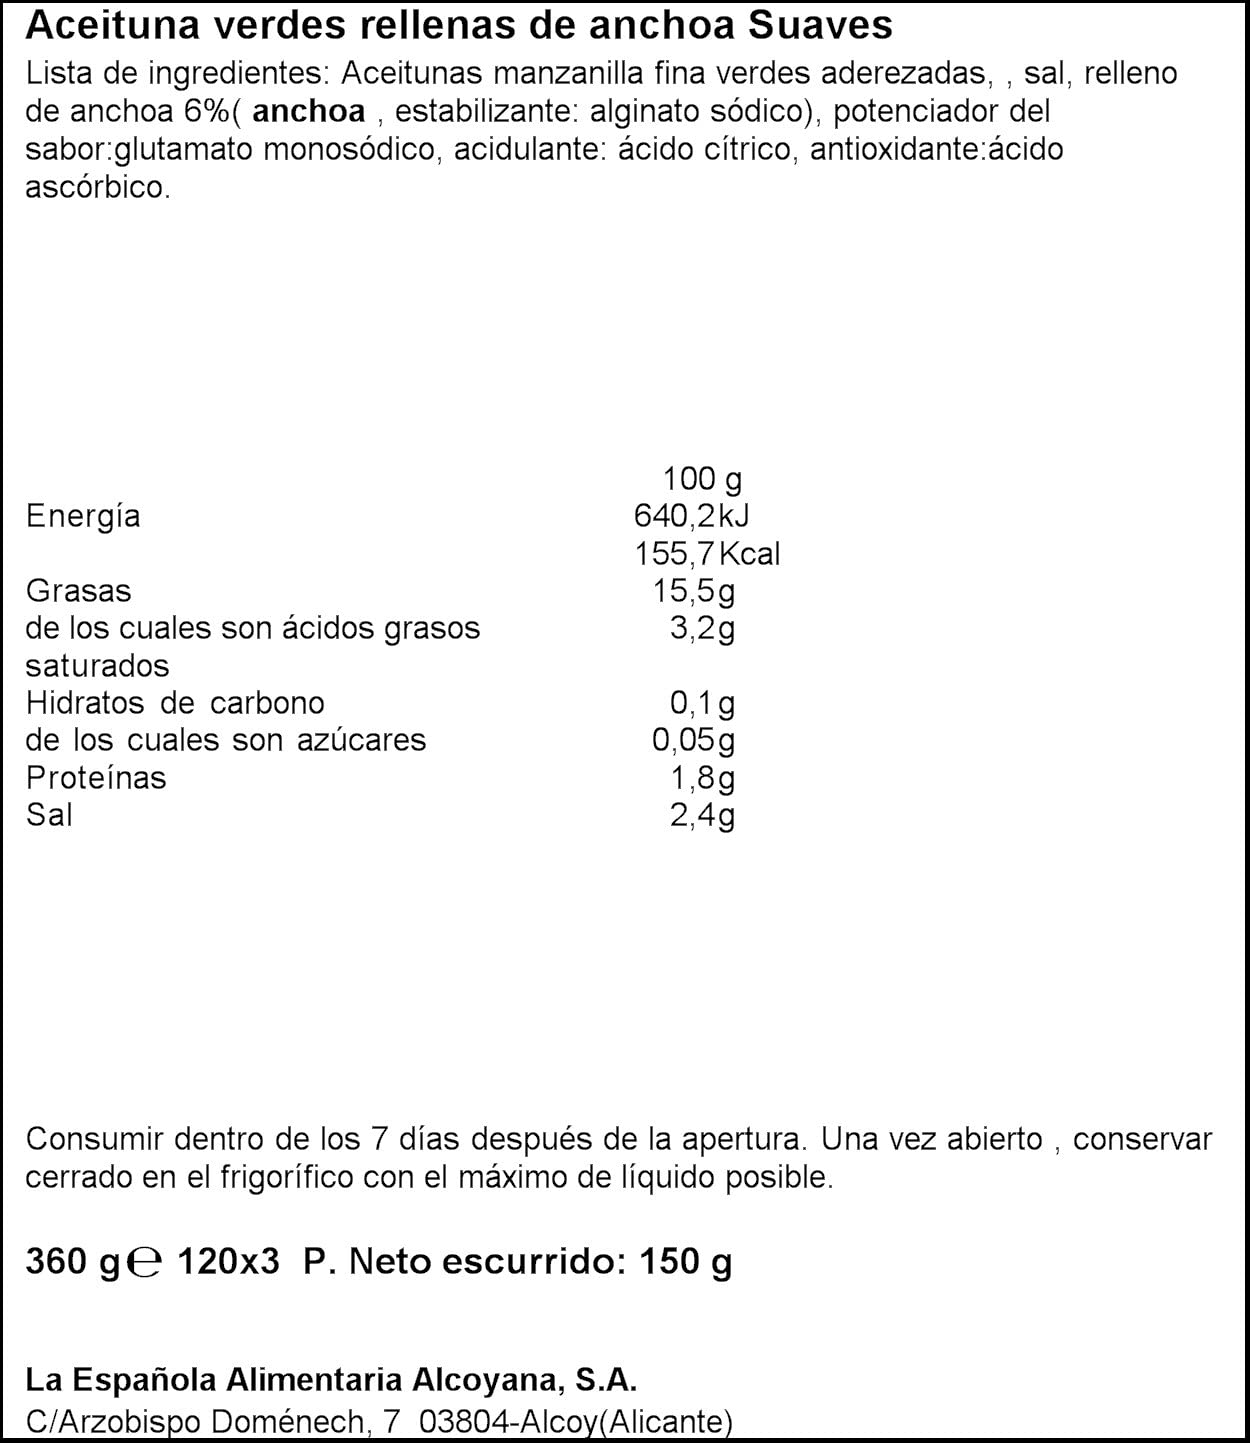 La Española - Aceitunas verdes rellenas de anchoa suaves - 3 ...